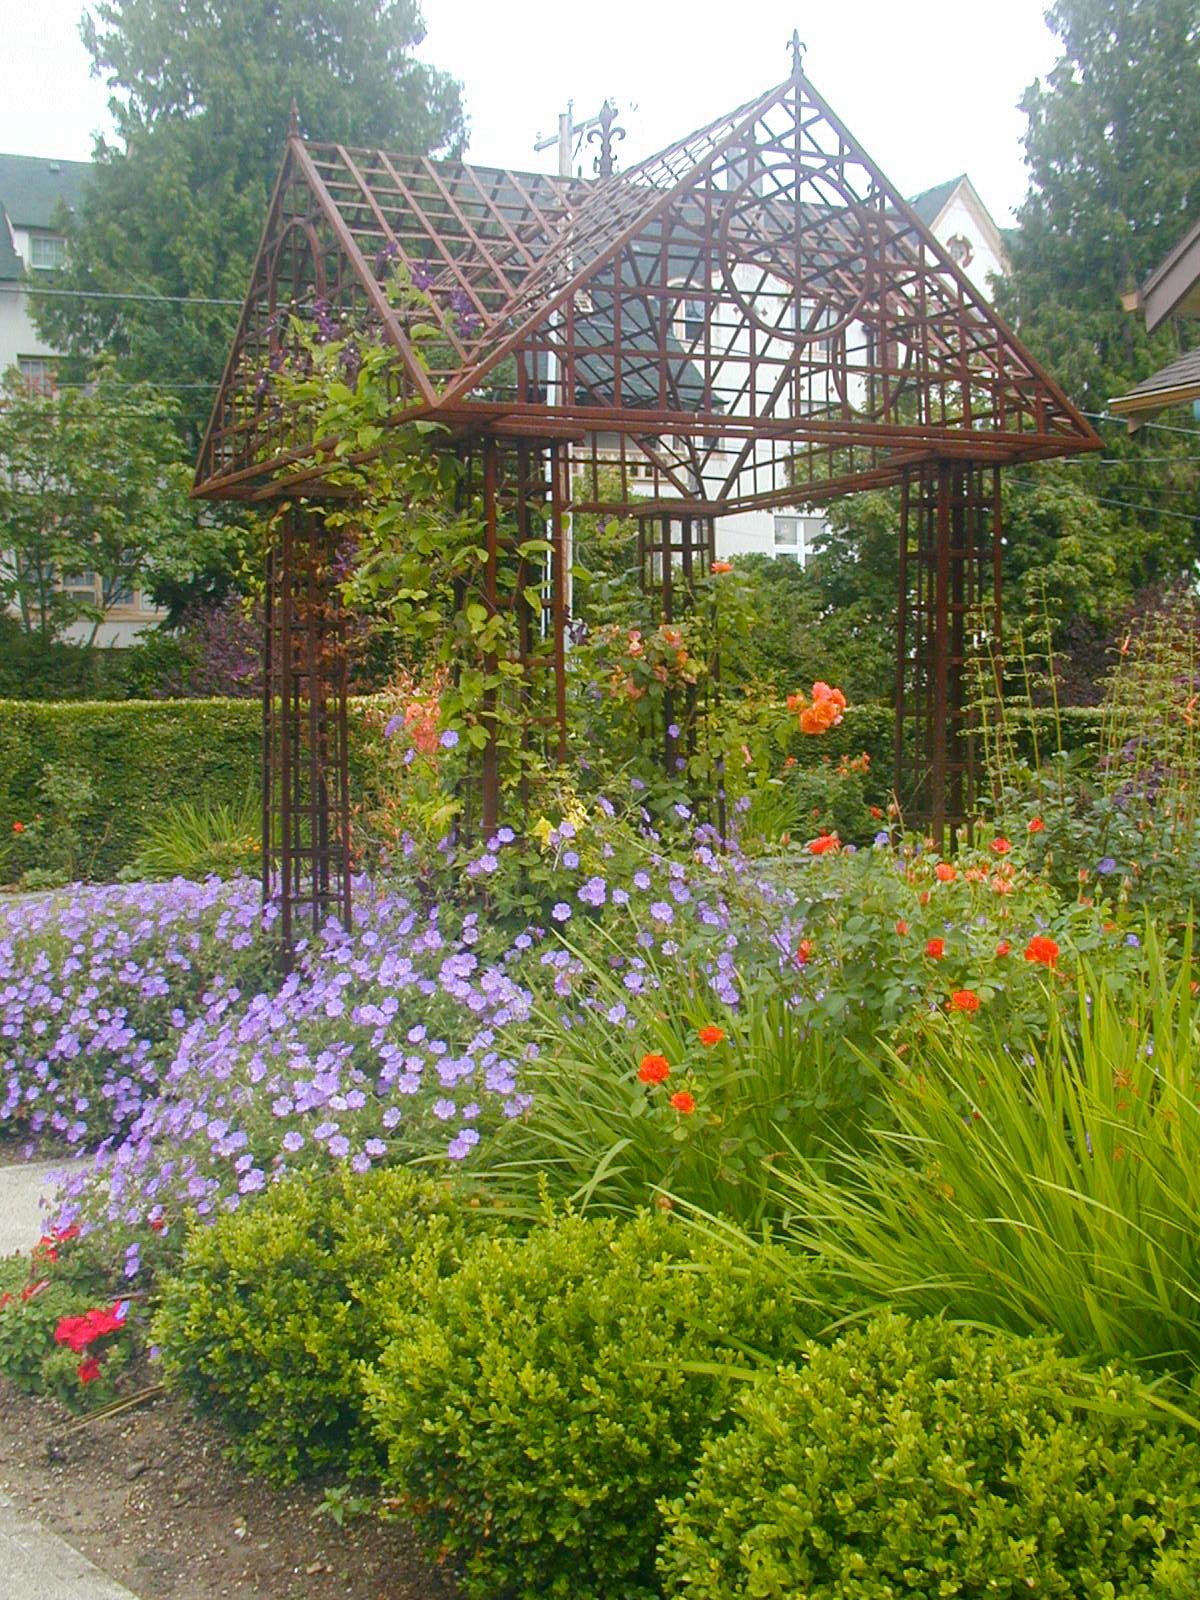 Formal Mediterranean Garden - Creative Landscapes, Inc.